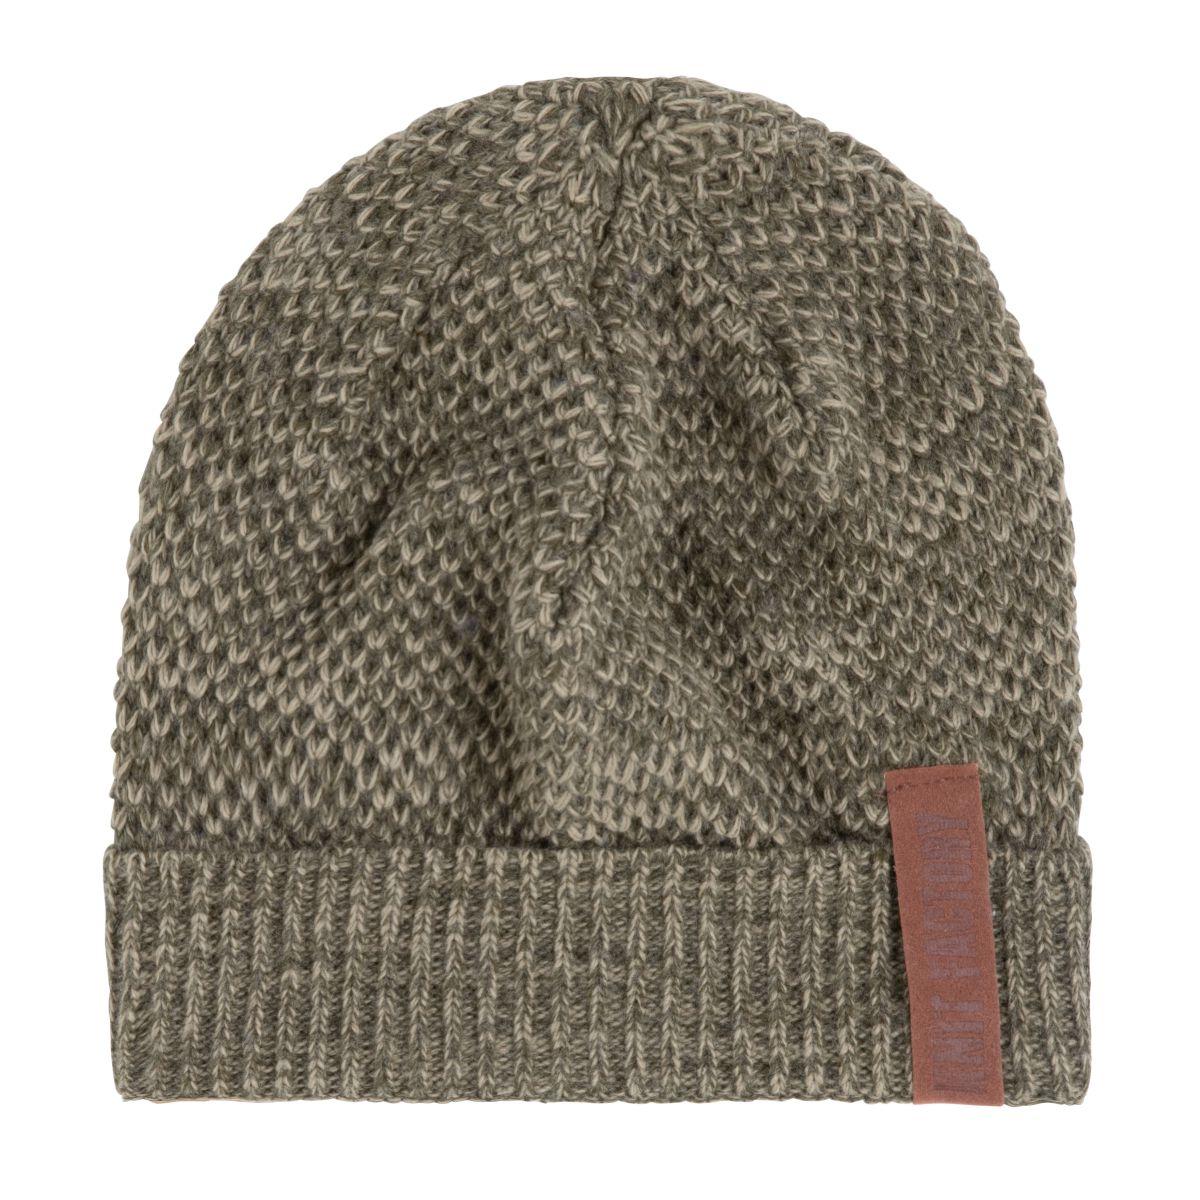 knit factory 1237044 jazz beanie groen olive 1